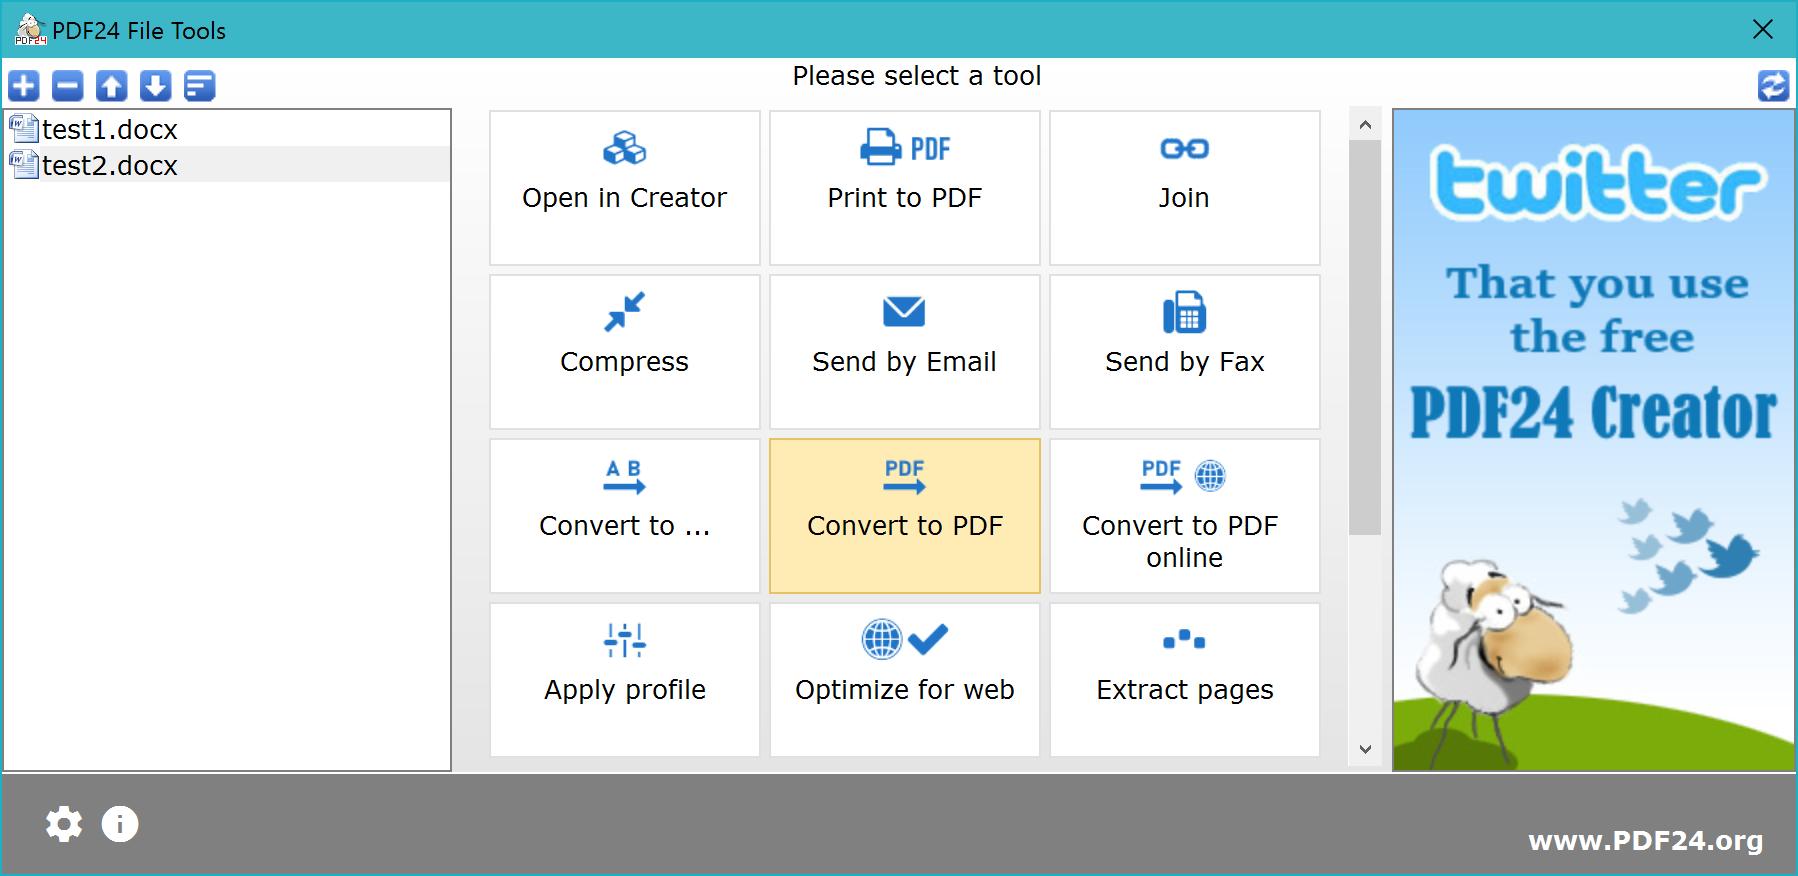 Click Convert to PDF